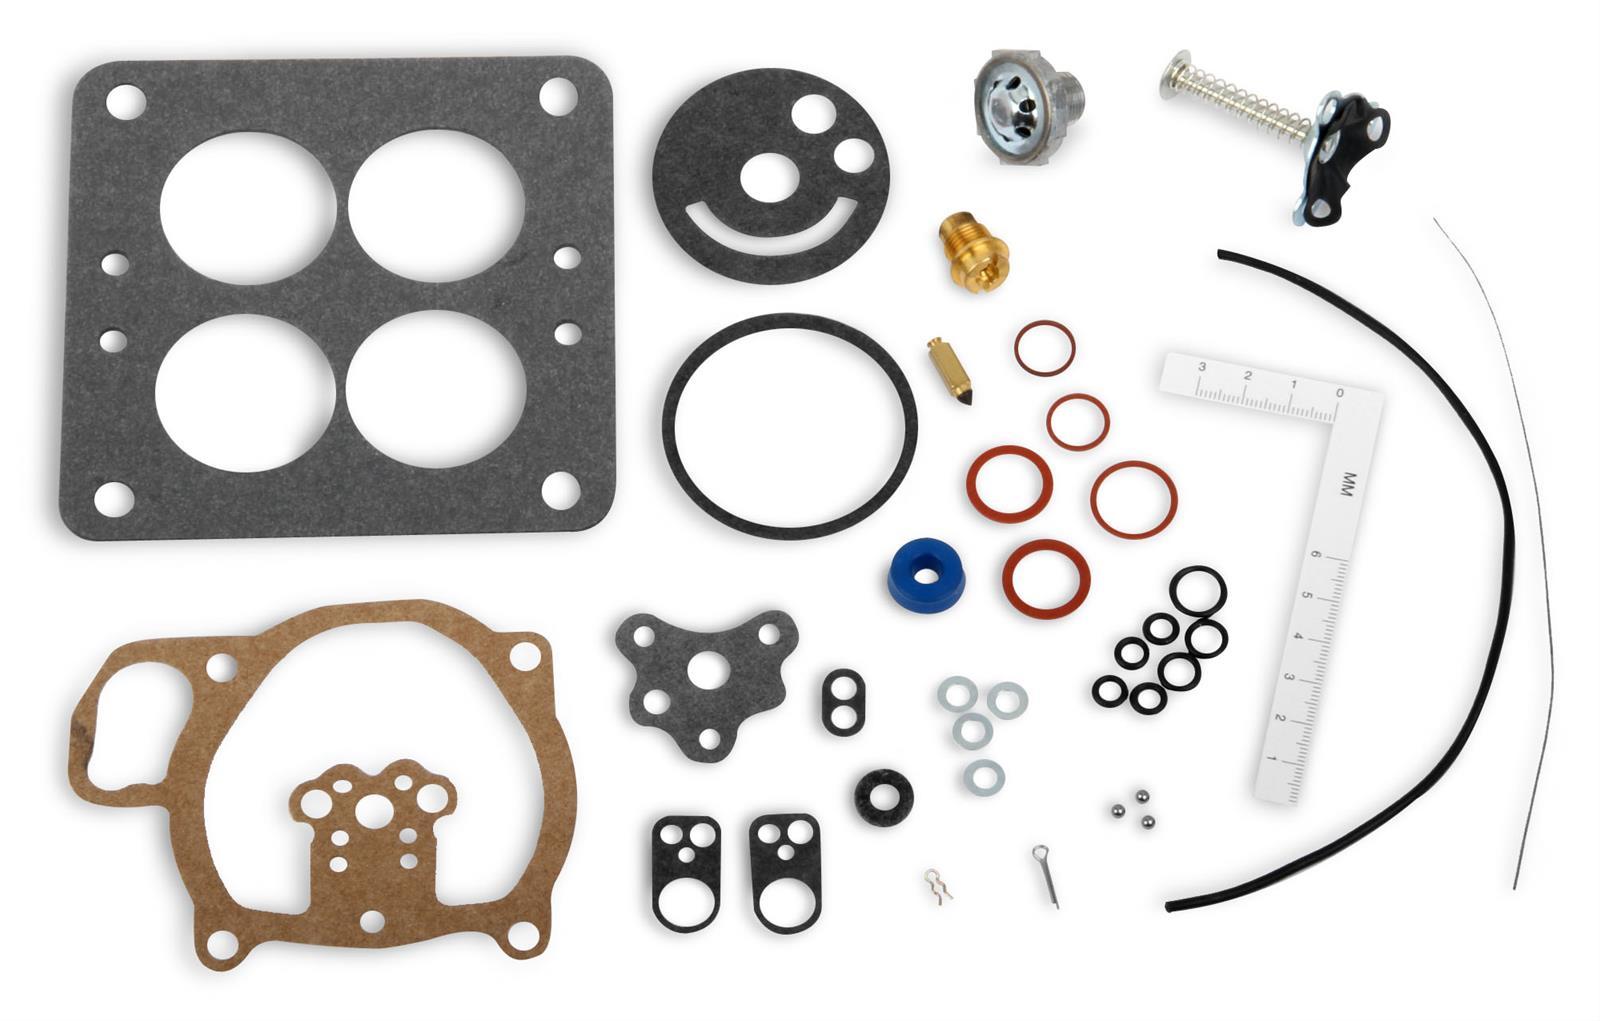 Holley Performance 3-1346 Renew Carburetor Rebuild Kit